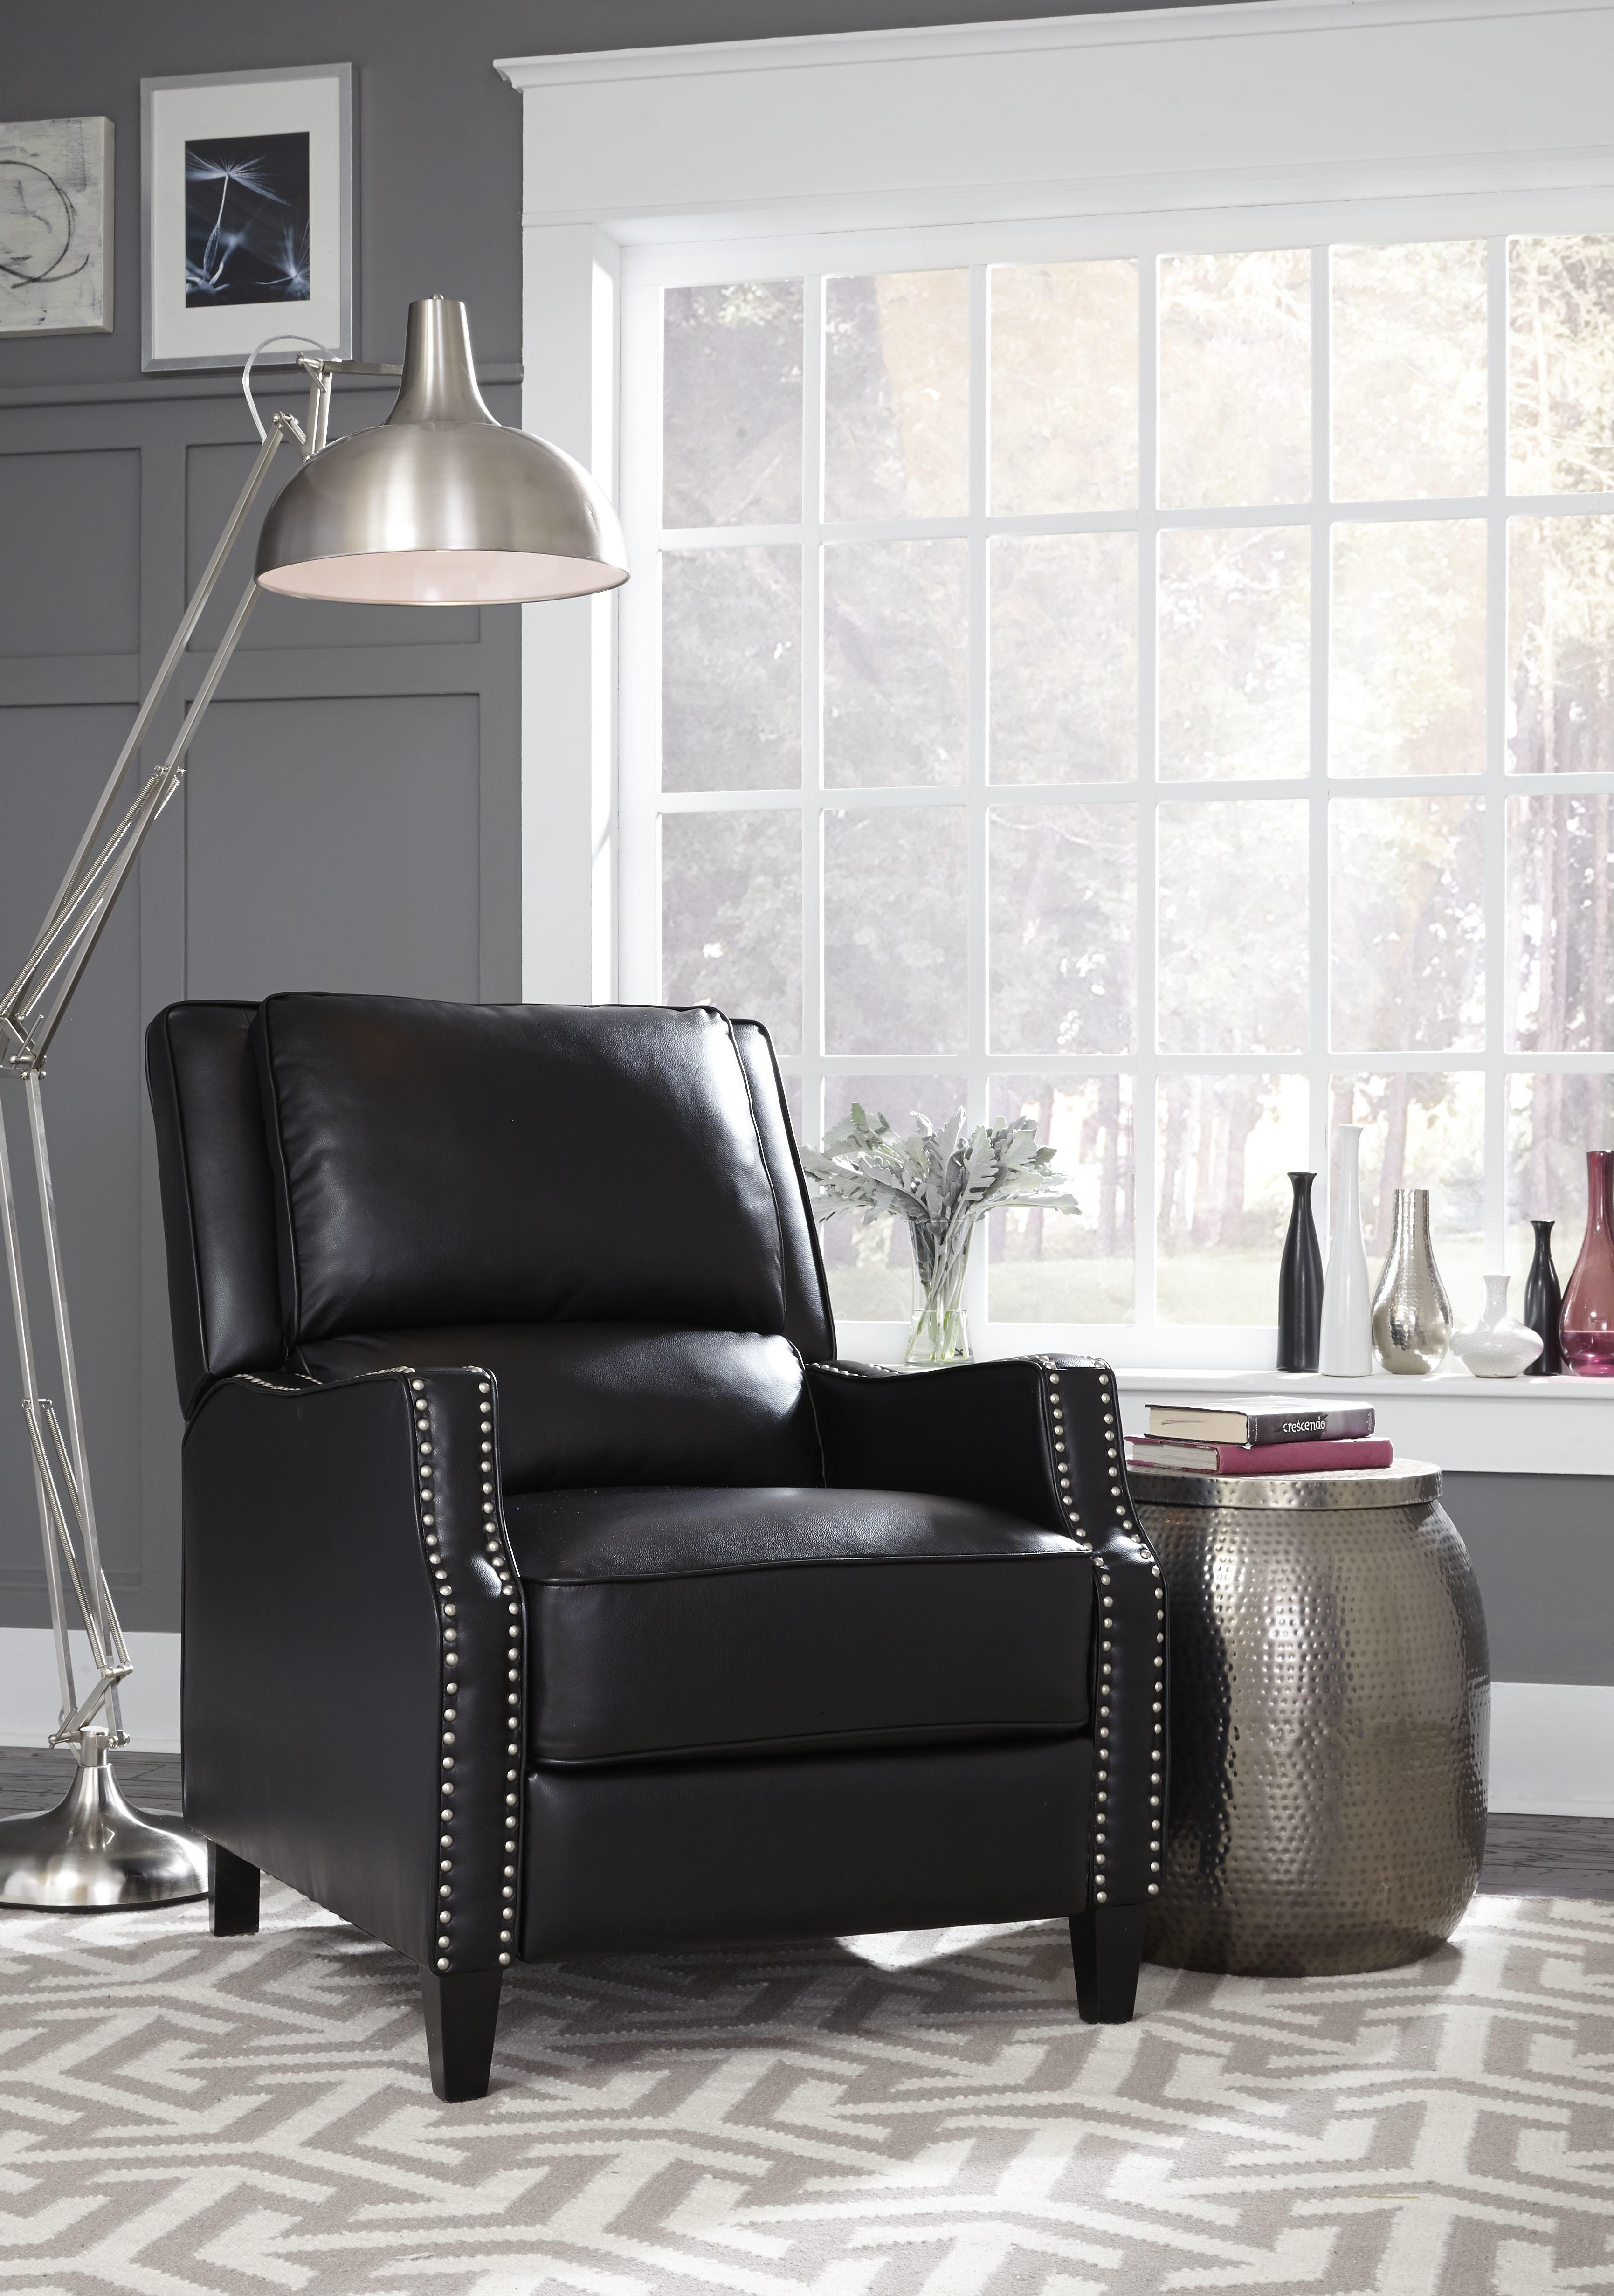 Alston Black Recliner Accent Chair